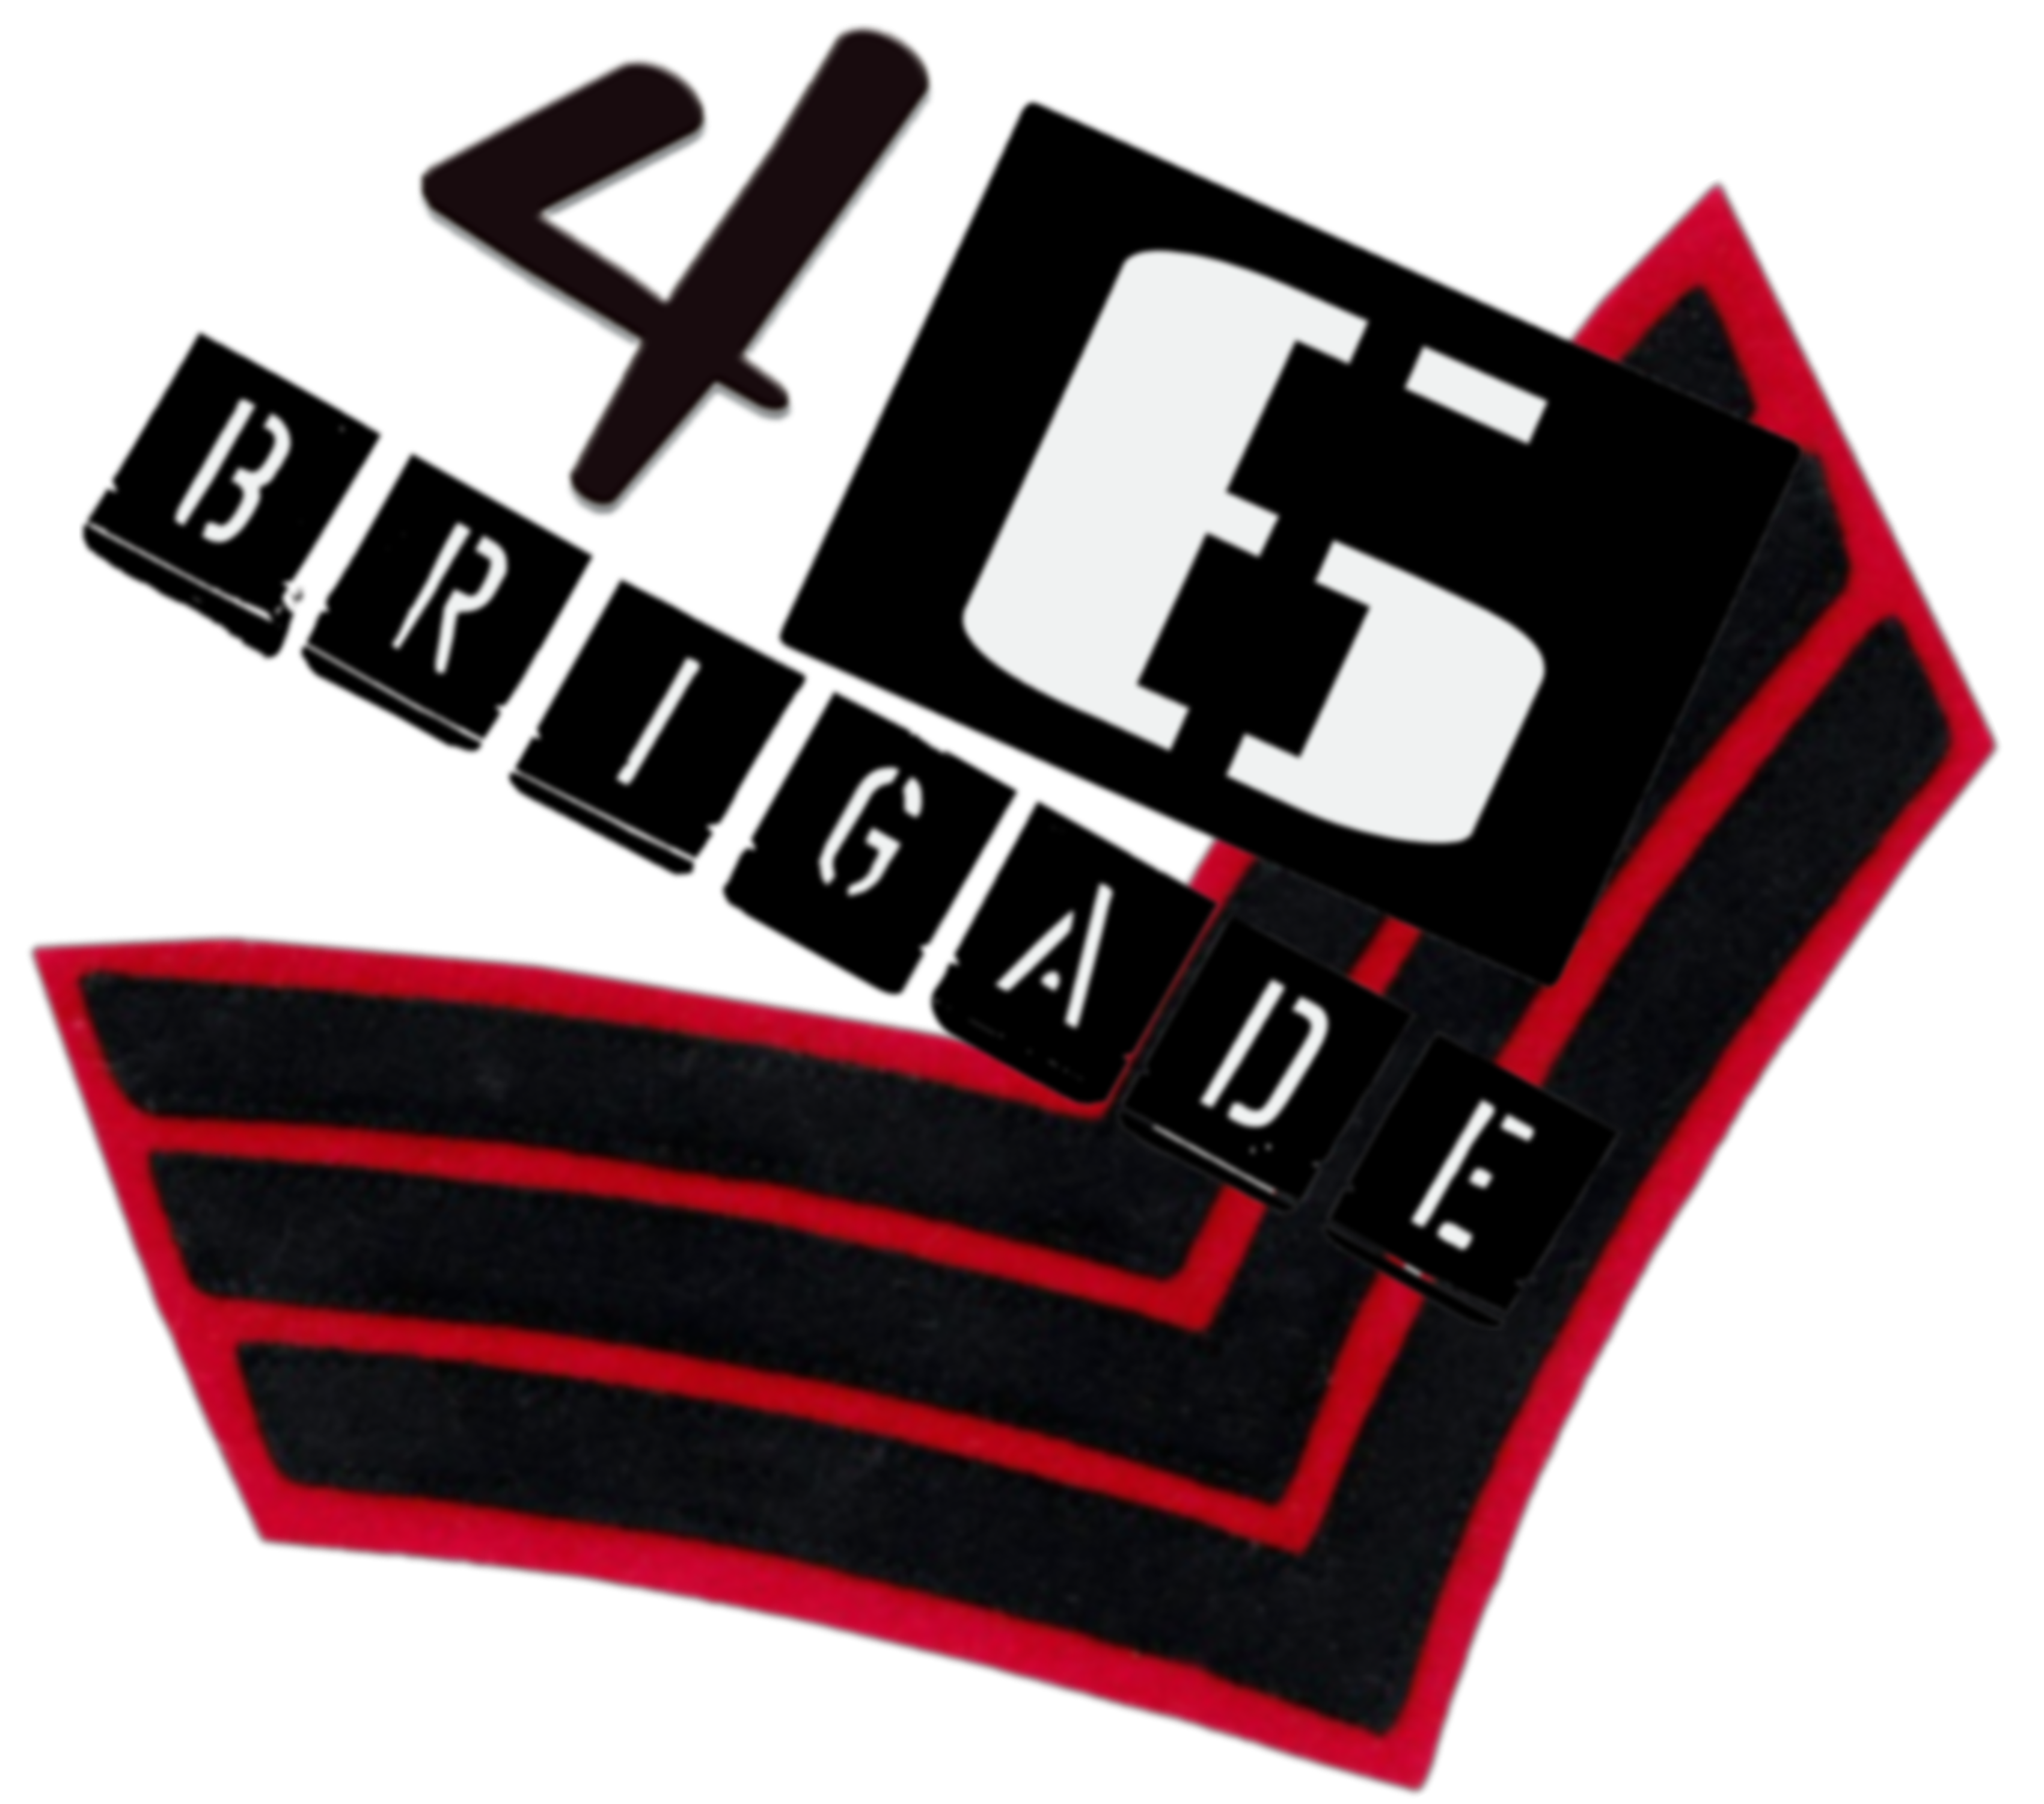 46 Brigade Merch